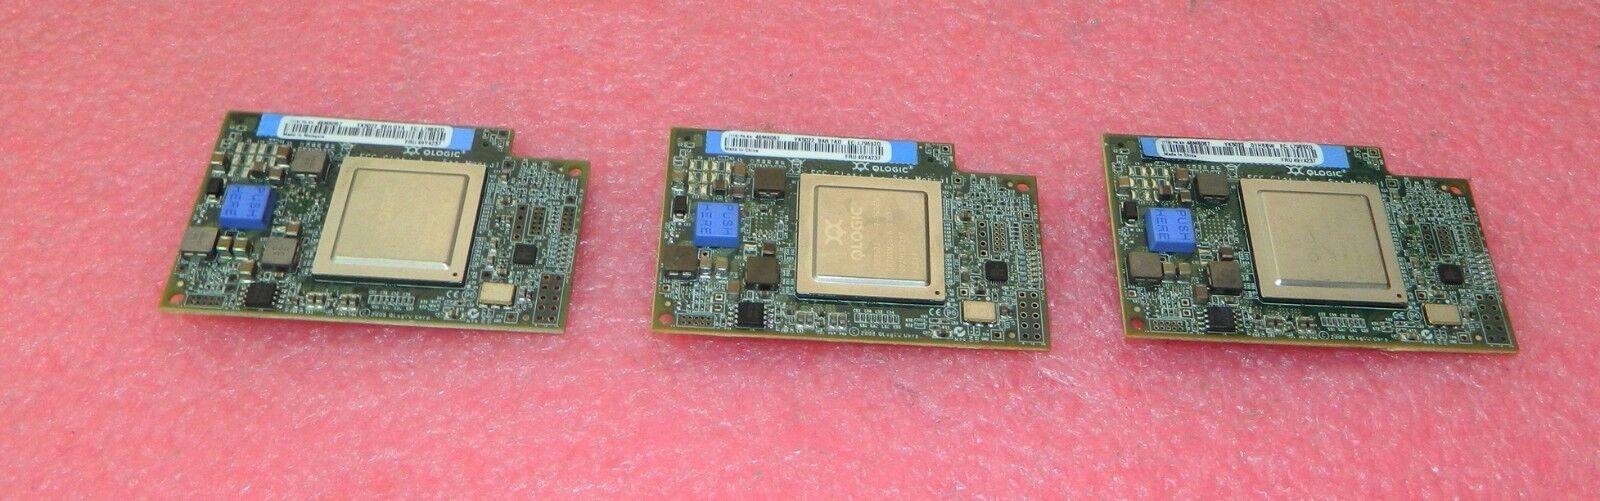 Lot of 3 IBM QMI2572- IBM 4GB FC FIBER CHANNEL EXPANSION CARDS 49Y4237 46M6067